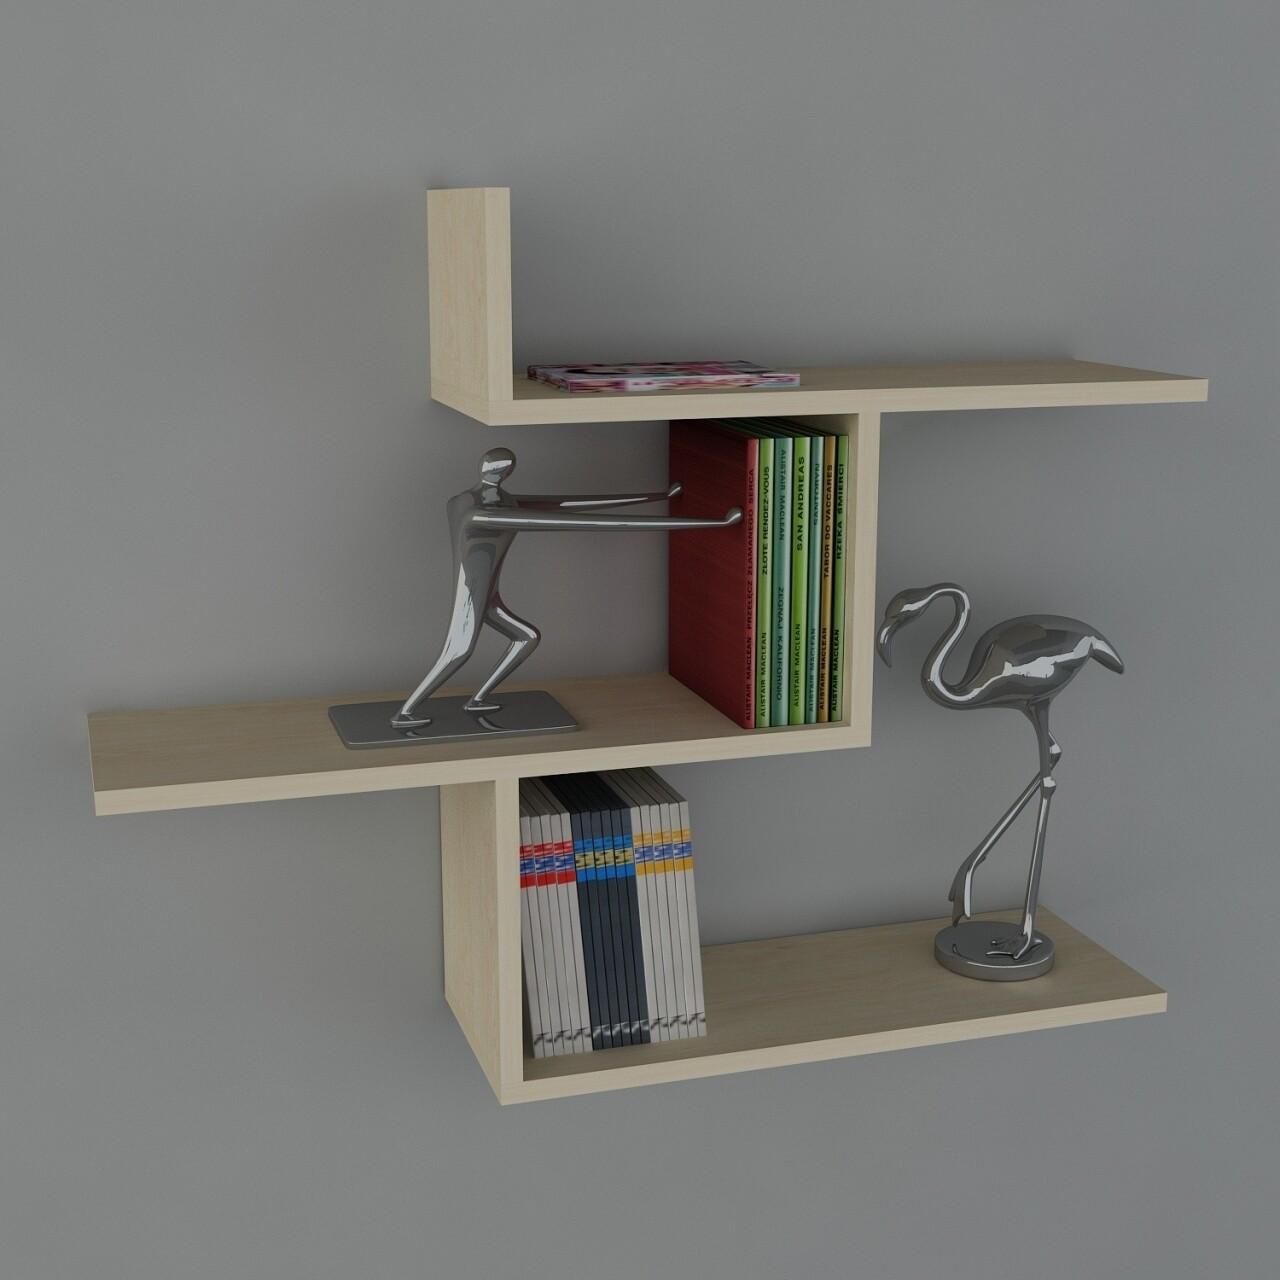 Raft pentru perete, Wooden Art, Bien Birch, 89.5x70.5x22 cm